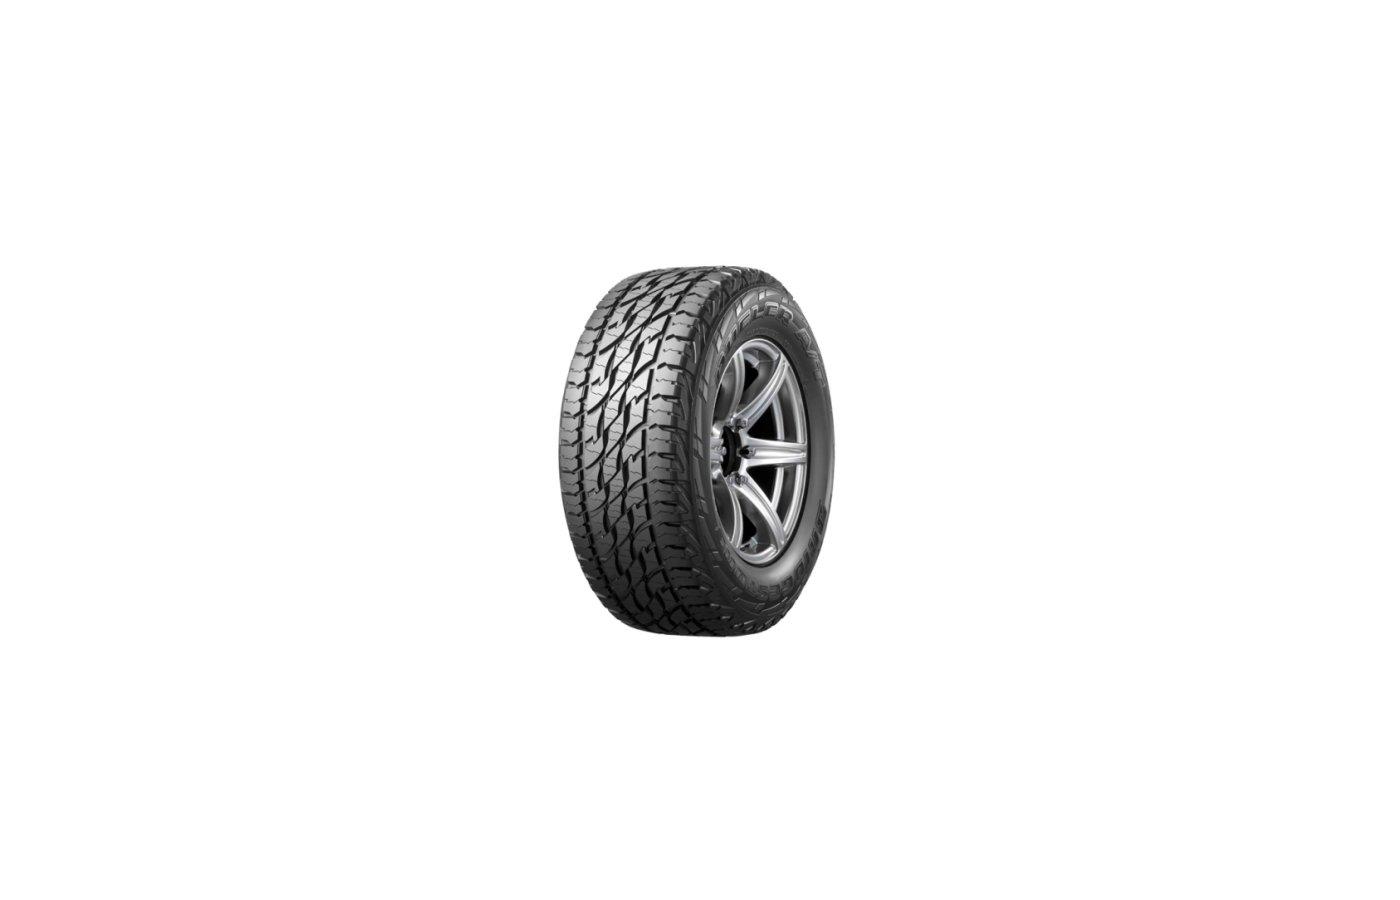 Шина Bridgestone Dueler A/T D697 235/75 R15 TL 104/101S OWT